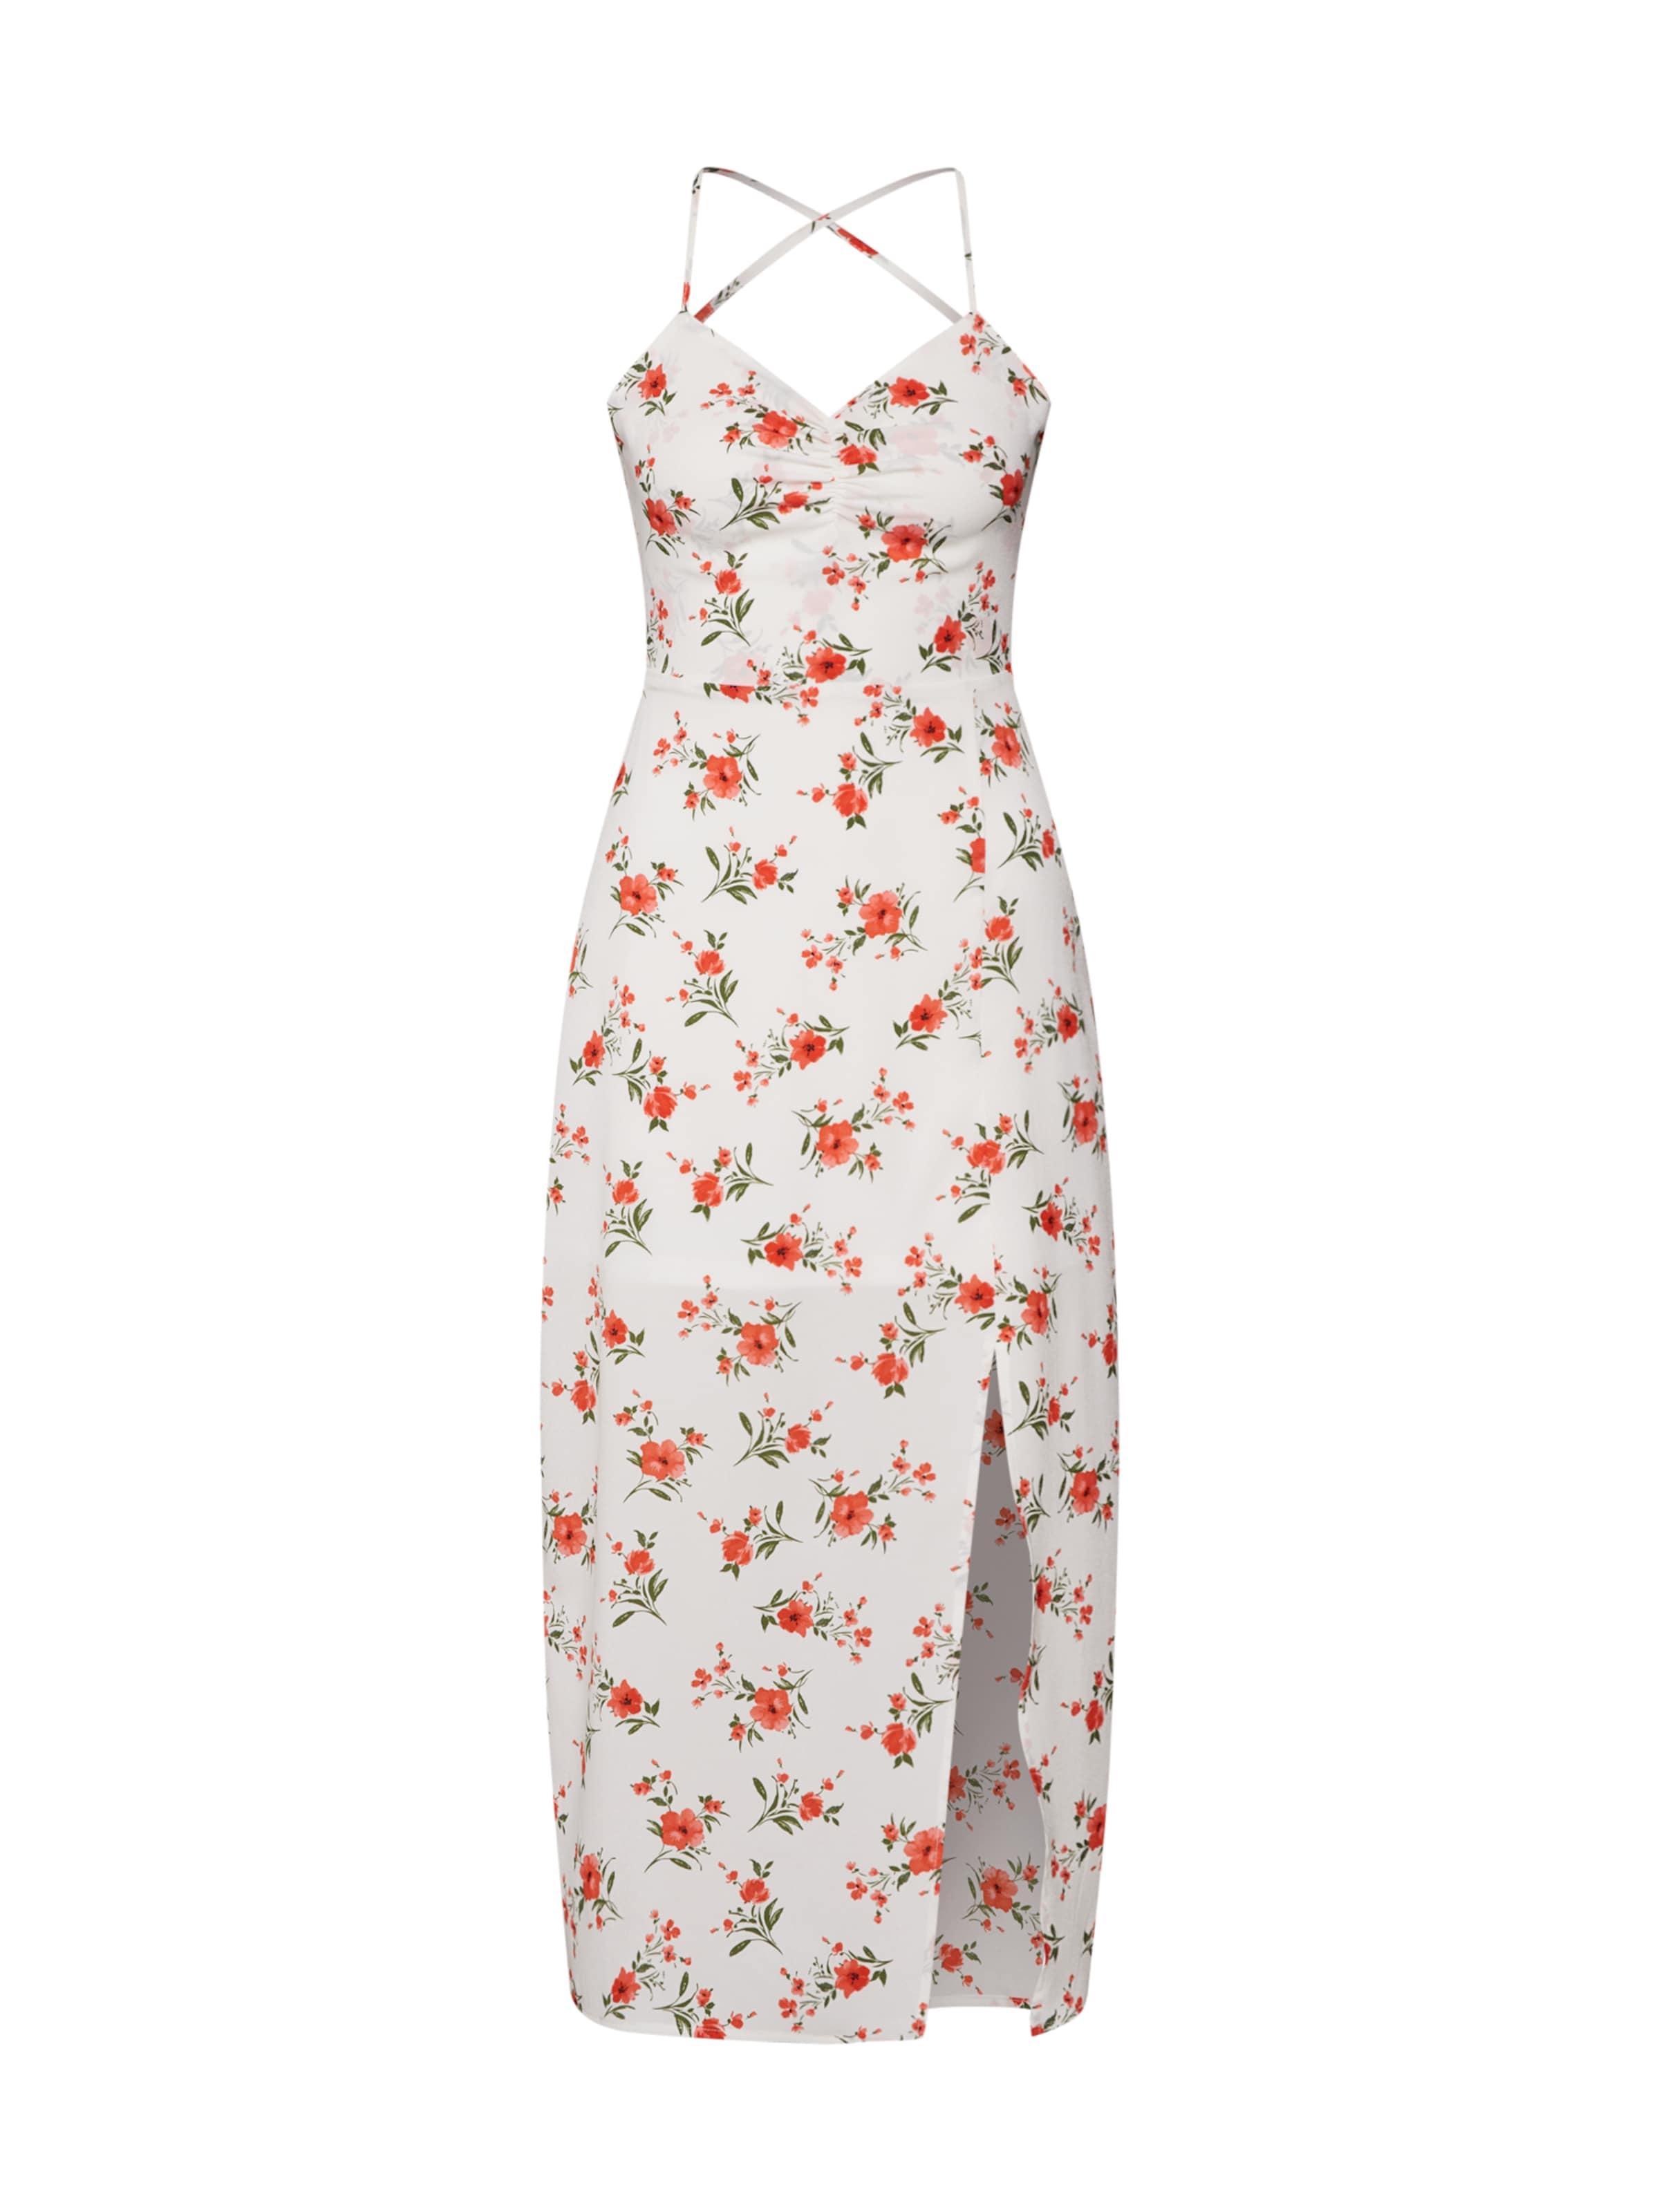 Weiß In Kleid Fashion Union 'peggy' Rosa GrünPink Rot TFK1cJl3